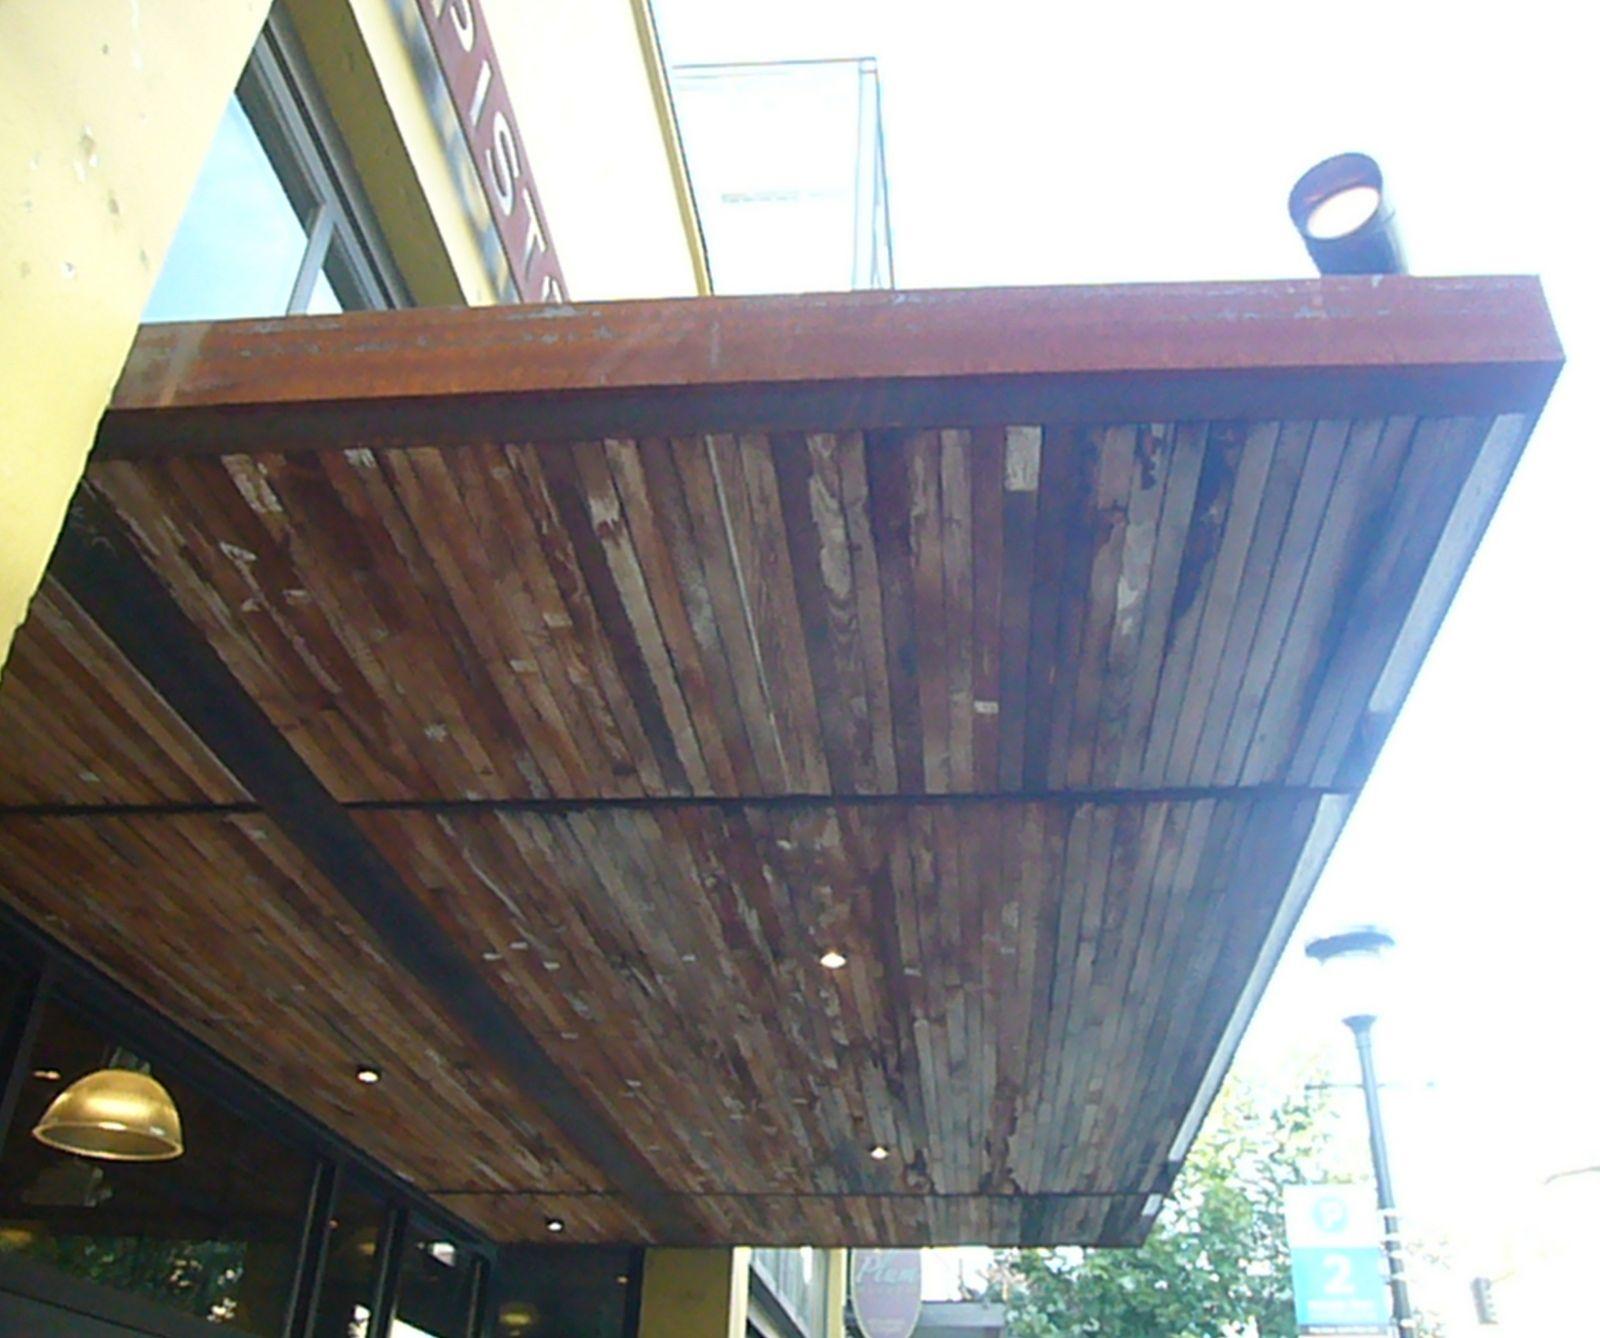 Rusty Metal & Reclaimed Wood Awning in 2020 | Metal awning ...